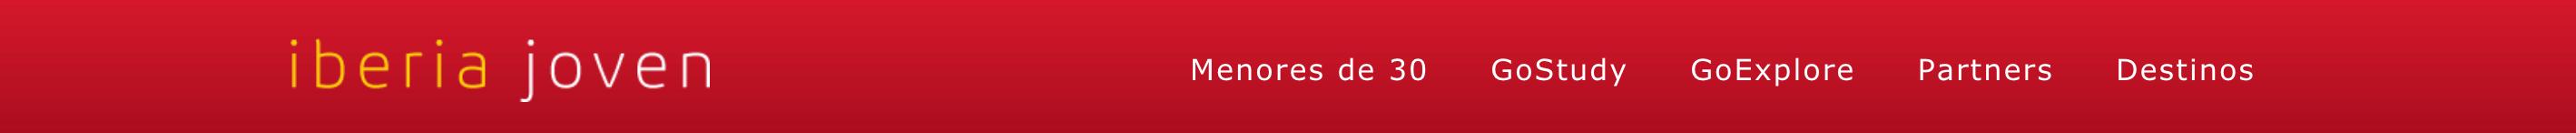 Iberia Joven